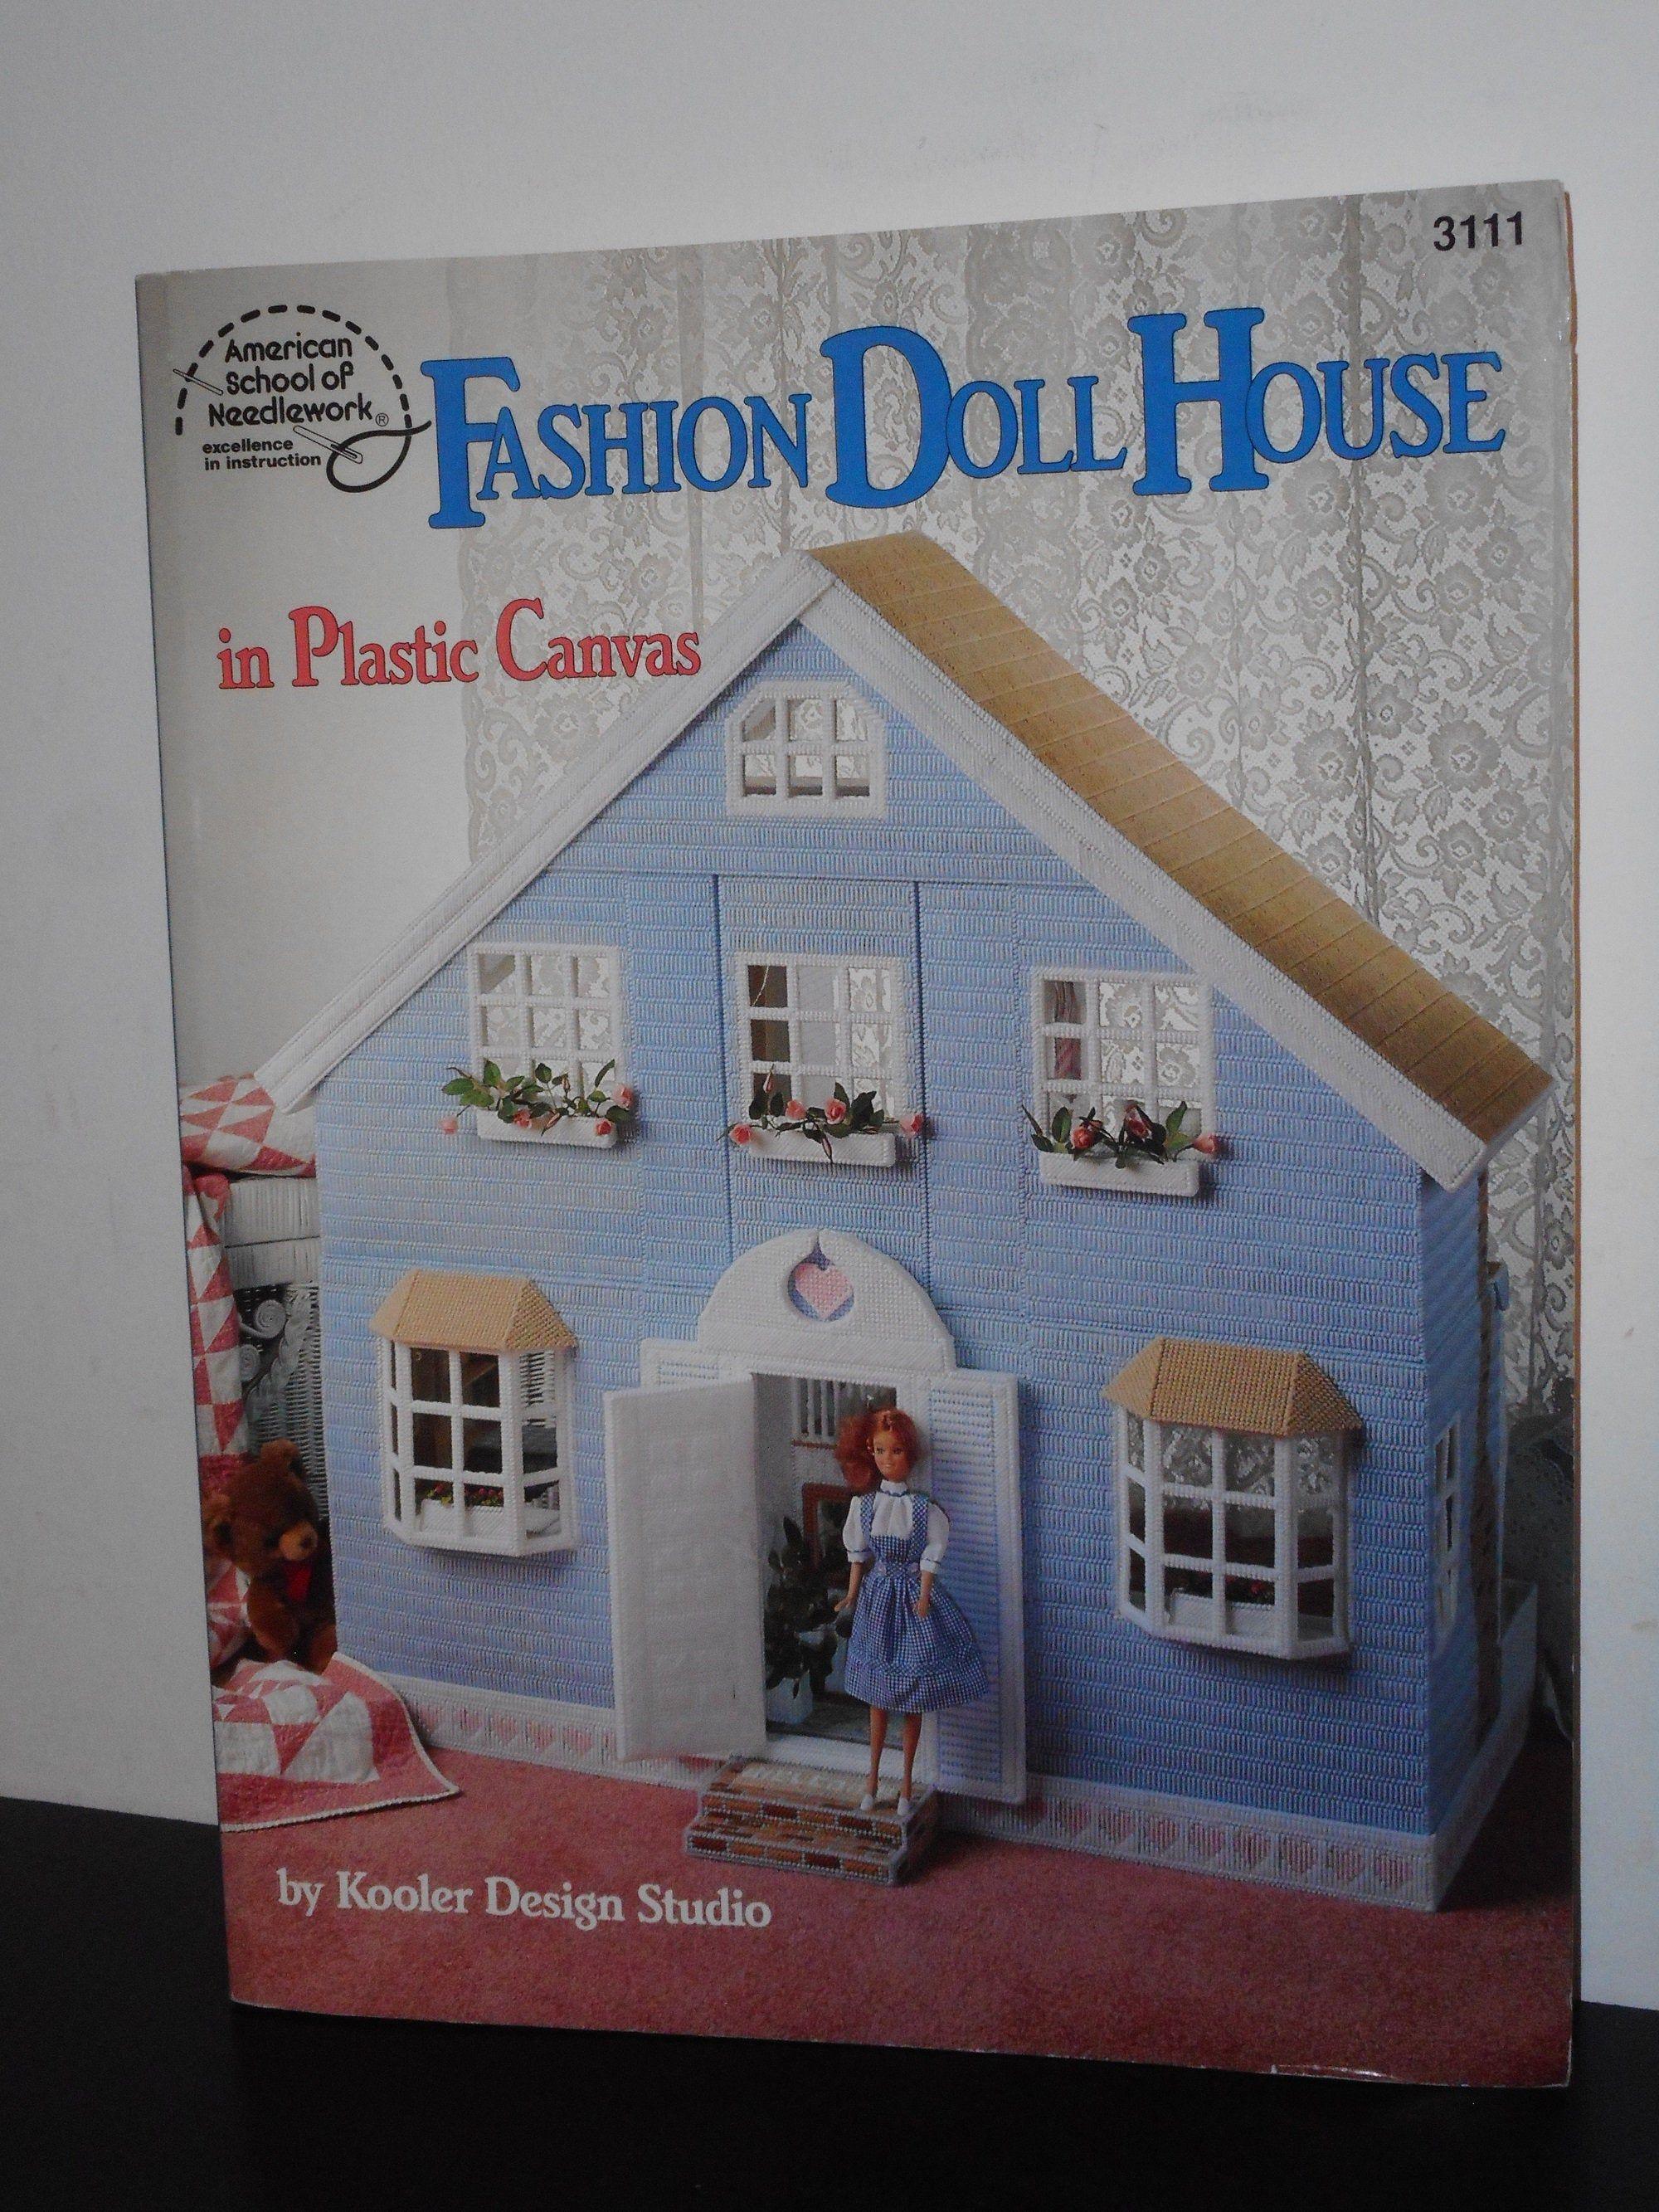 Fashion Doll House In Plastic Canvas American School Of Needlework Kooler Design Studio In 2020 Fashion Designer Studio Design Studio Design